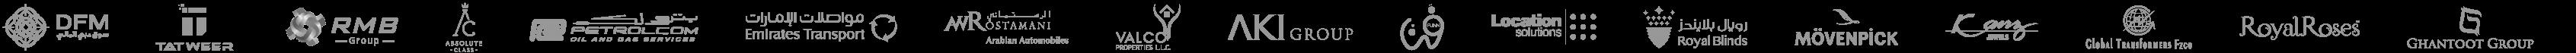 clients-list-evox